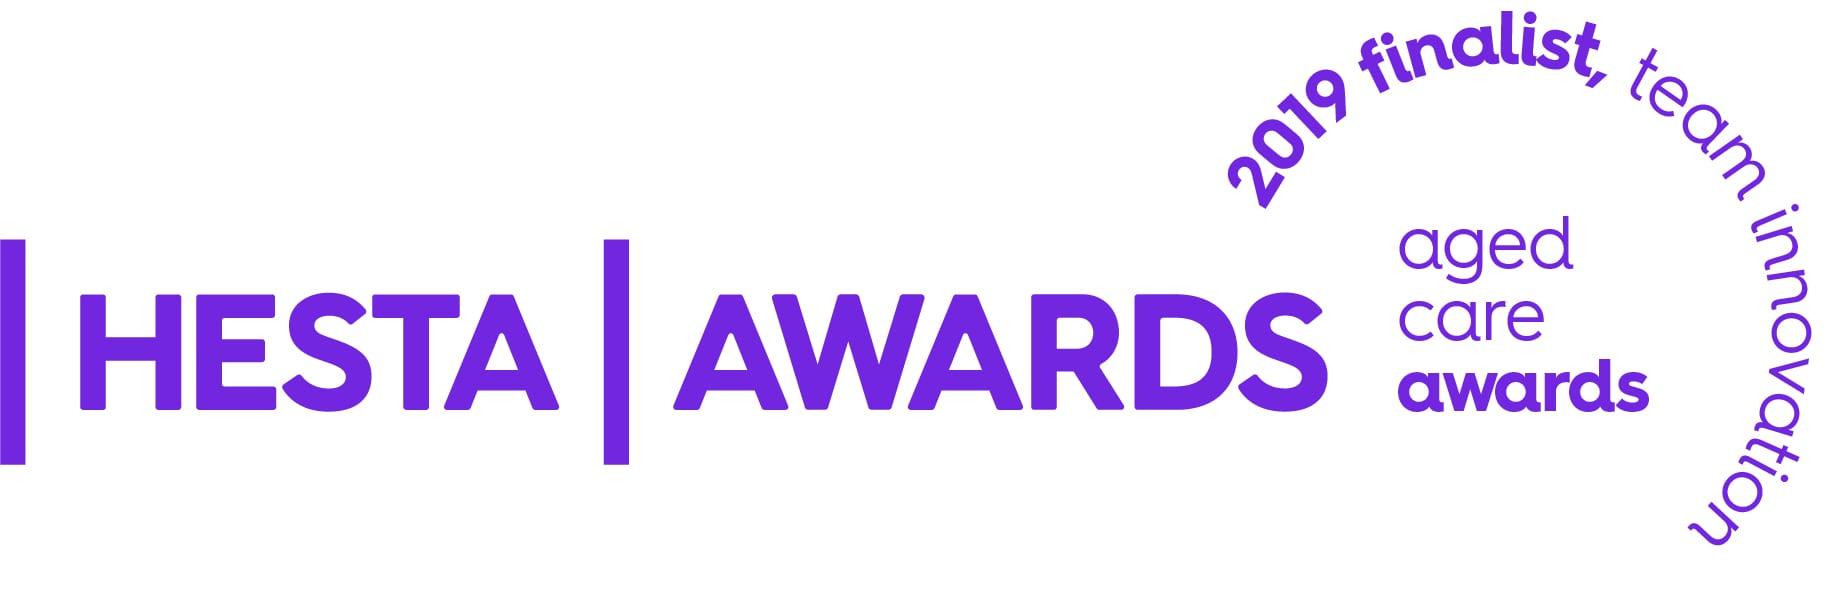 hesta award